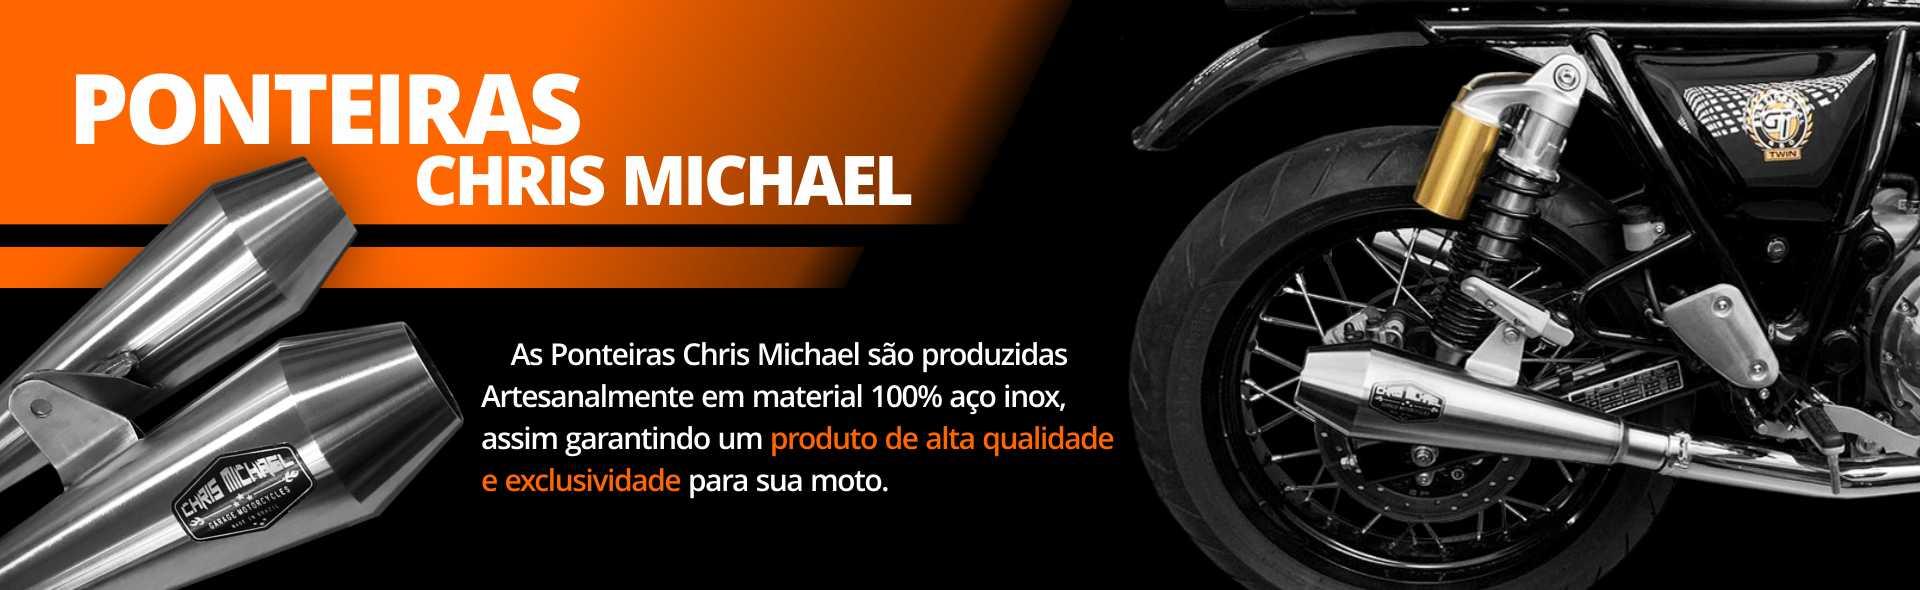 PRODUTO - CHRIS MICHAEL